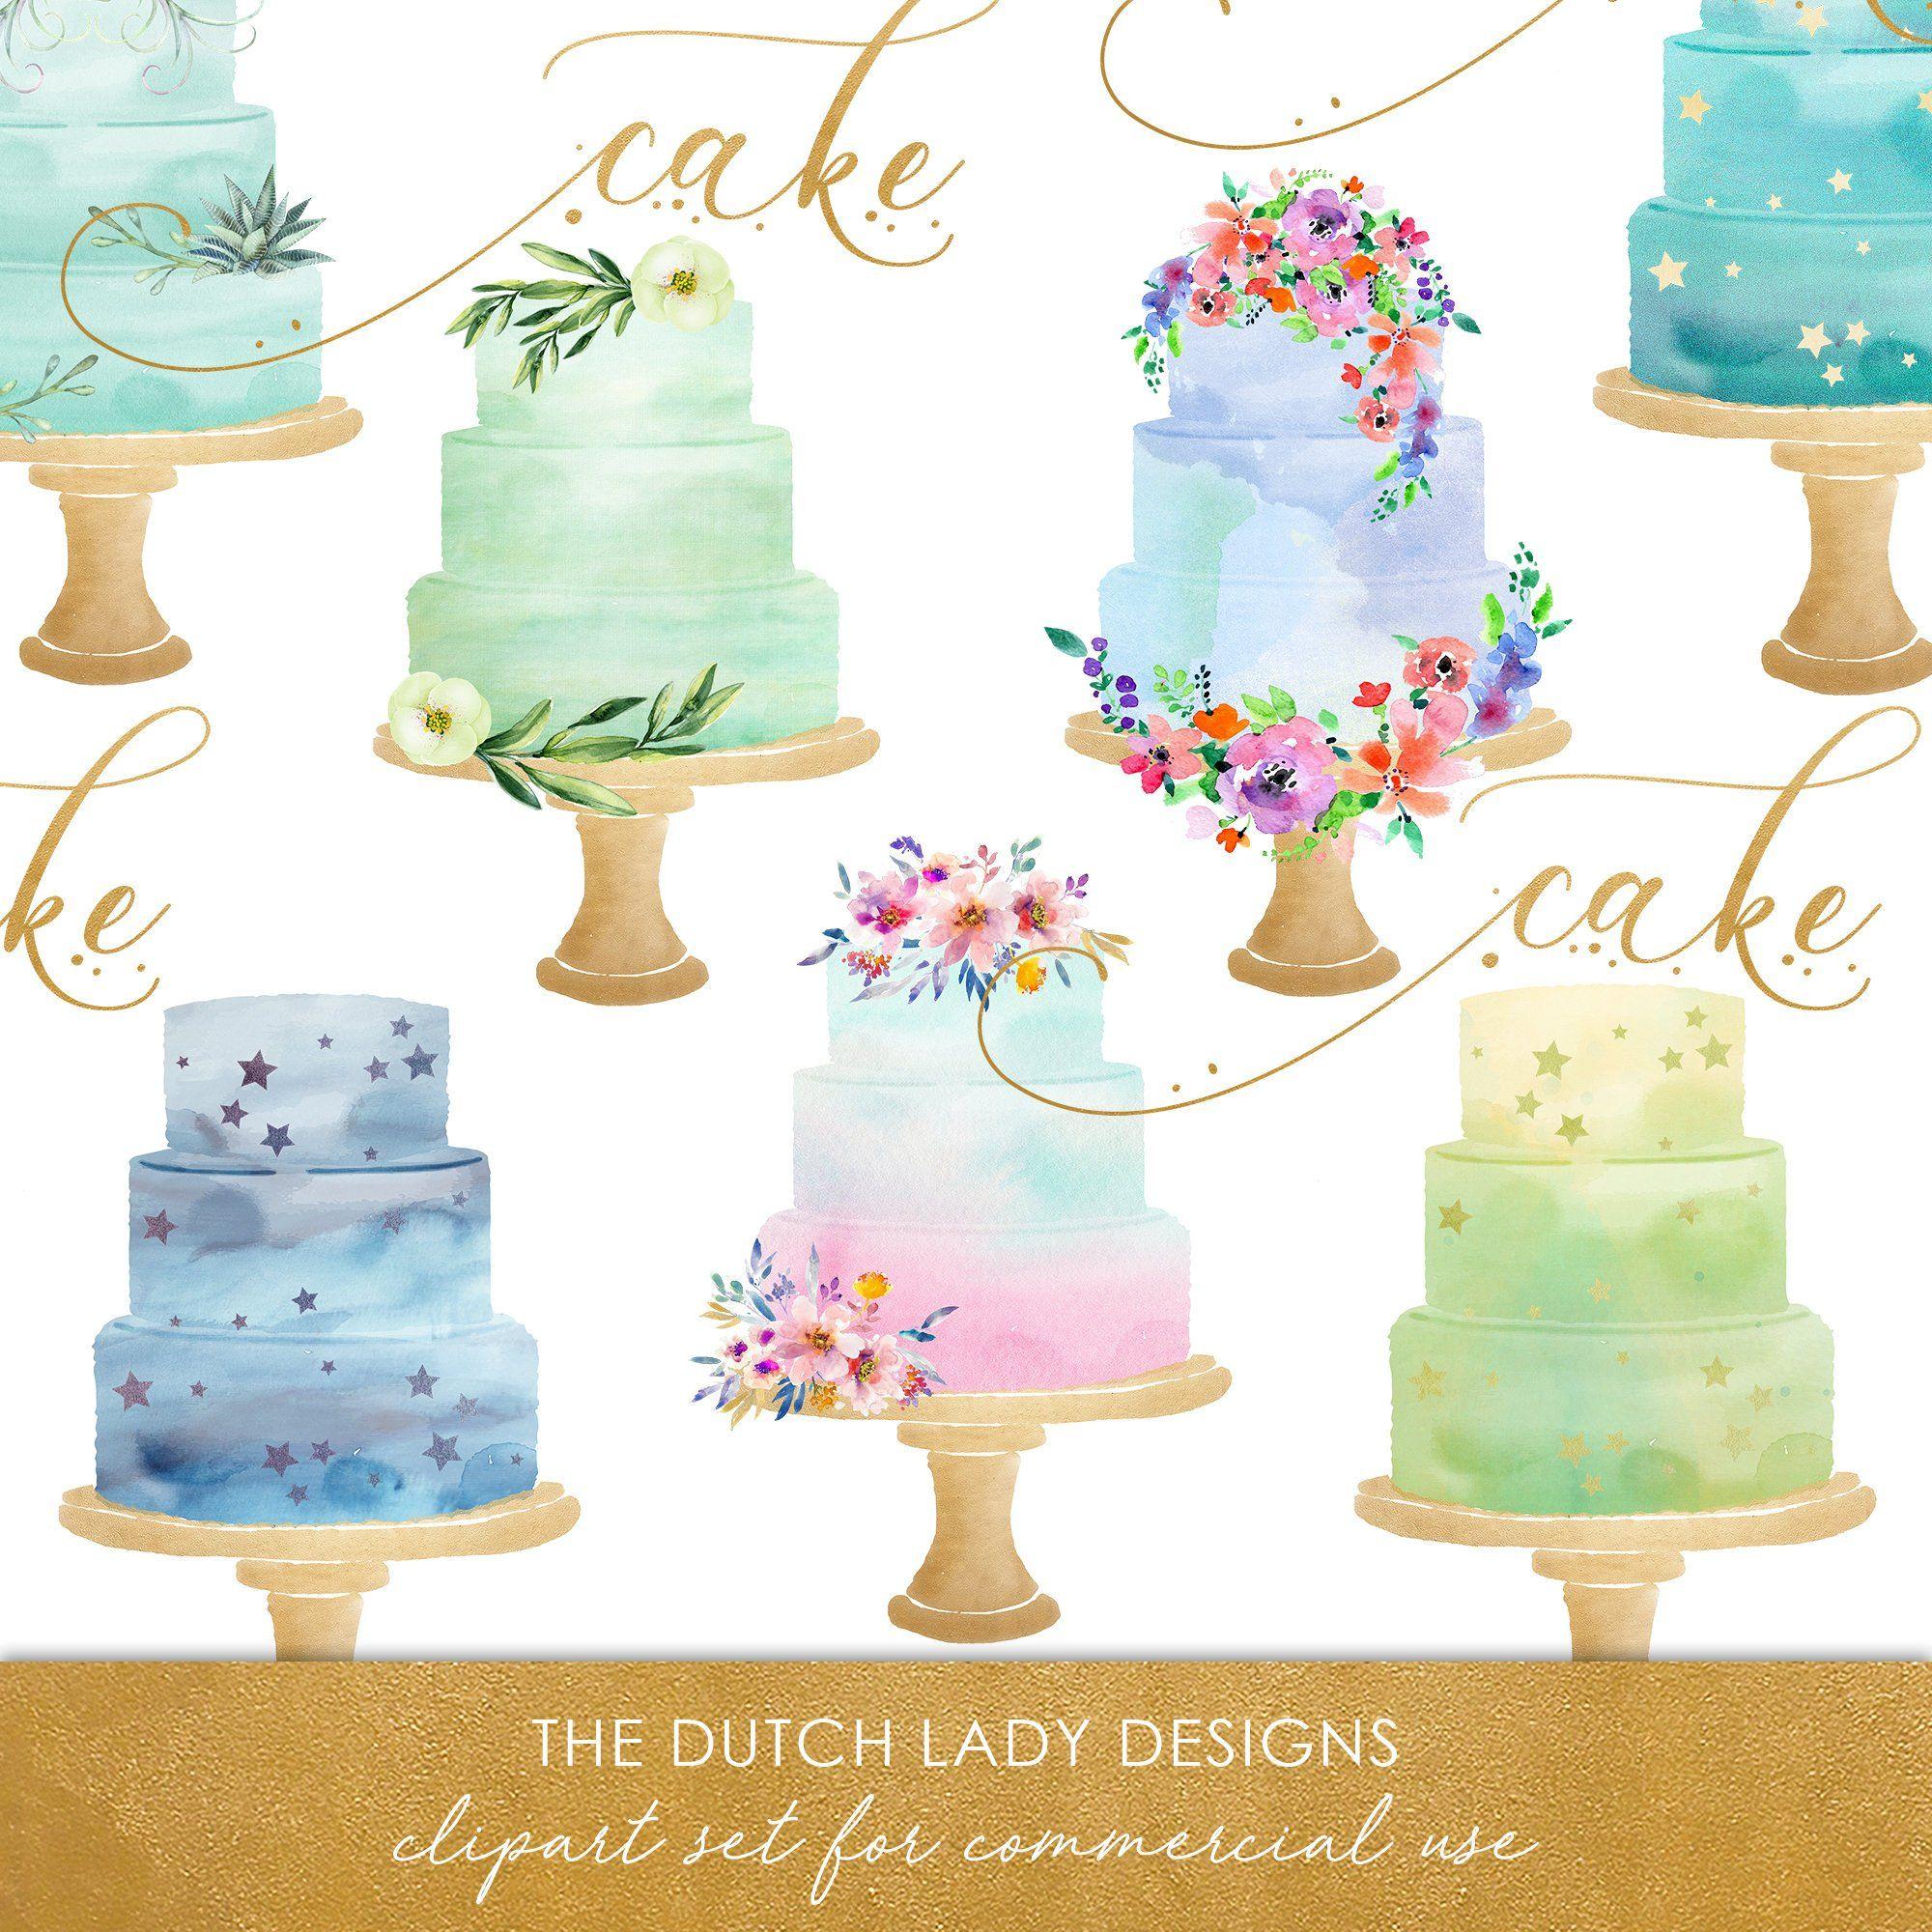 Watercolor Wedding Cake Clipart In Aqua Green Blue